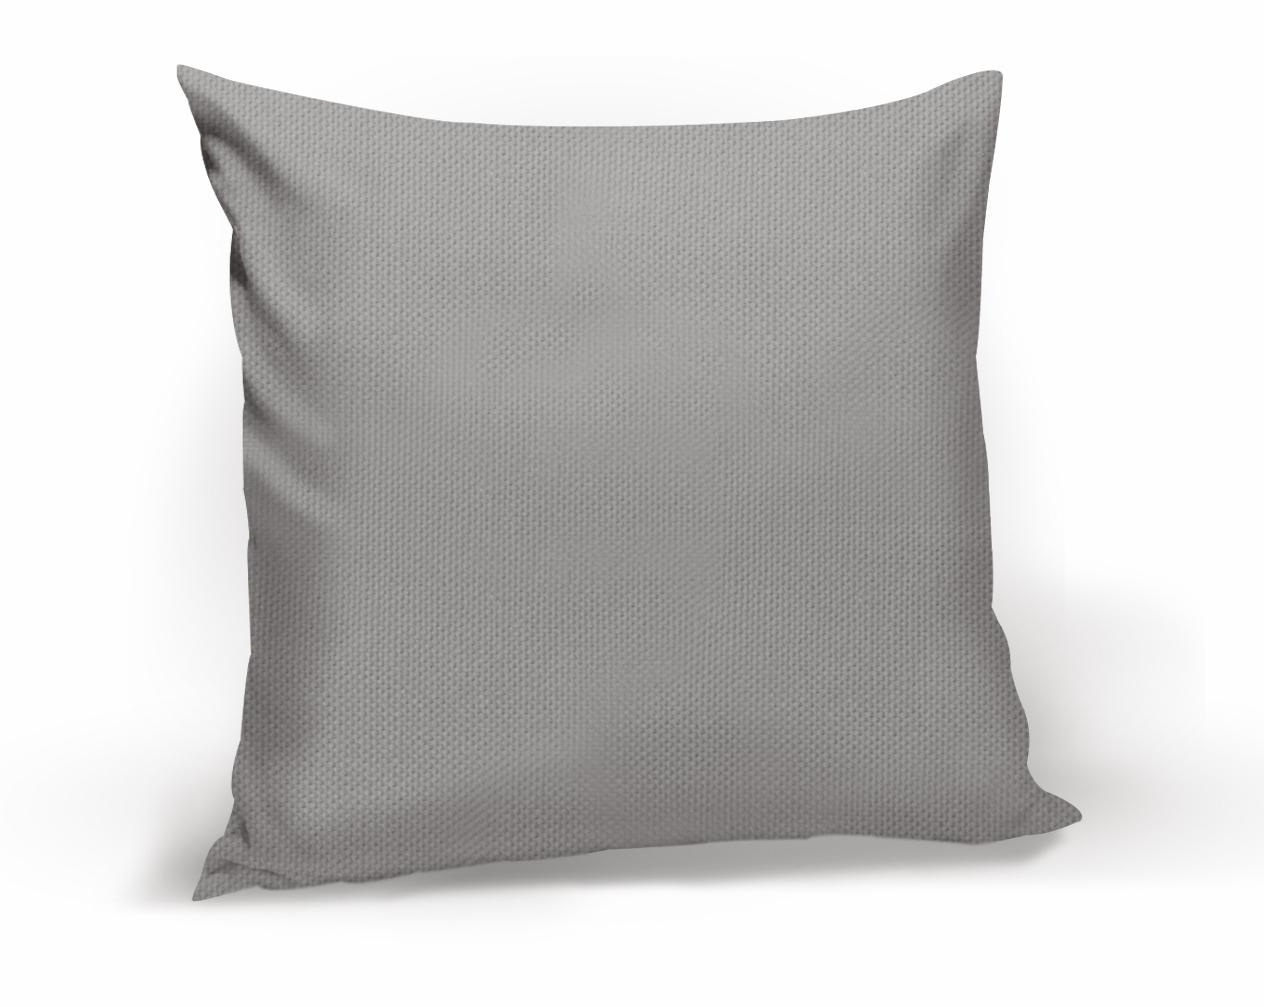 Декоративные подушки Kauffort Декоративная подушка Hosta Цвет: Серый (40х40) штора kauffort barolo k